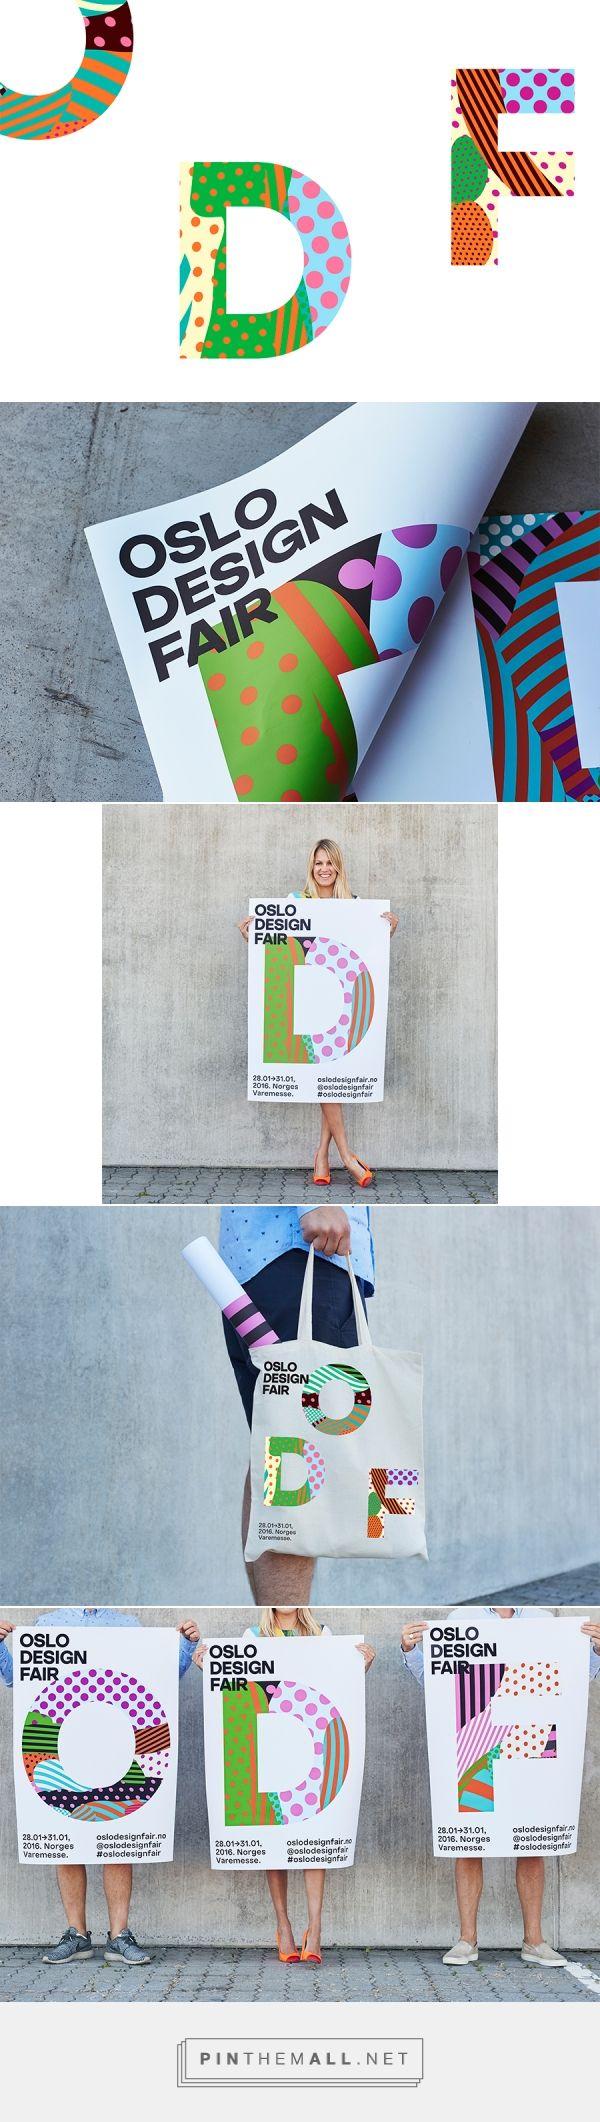 Brand & Id / Bielke & Yang: Oslo Design Fair — Collate